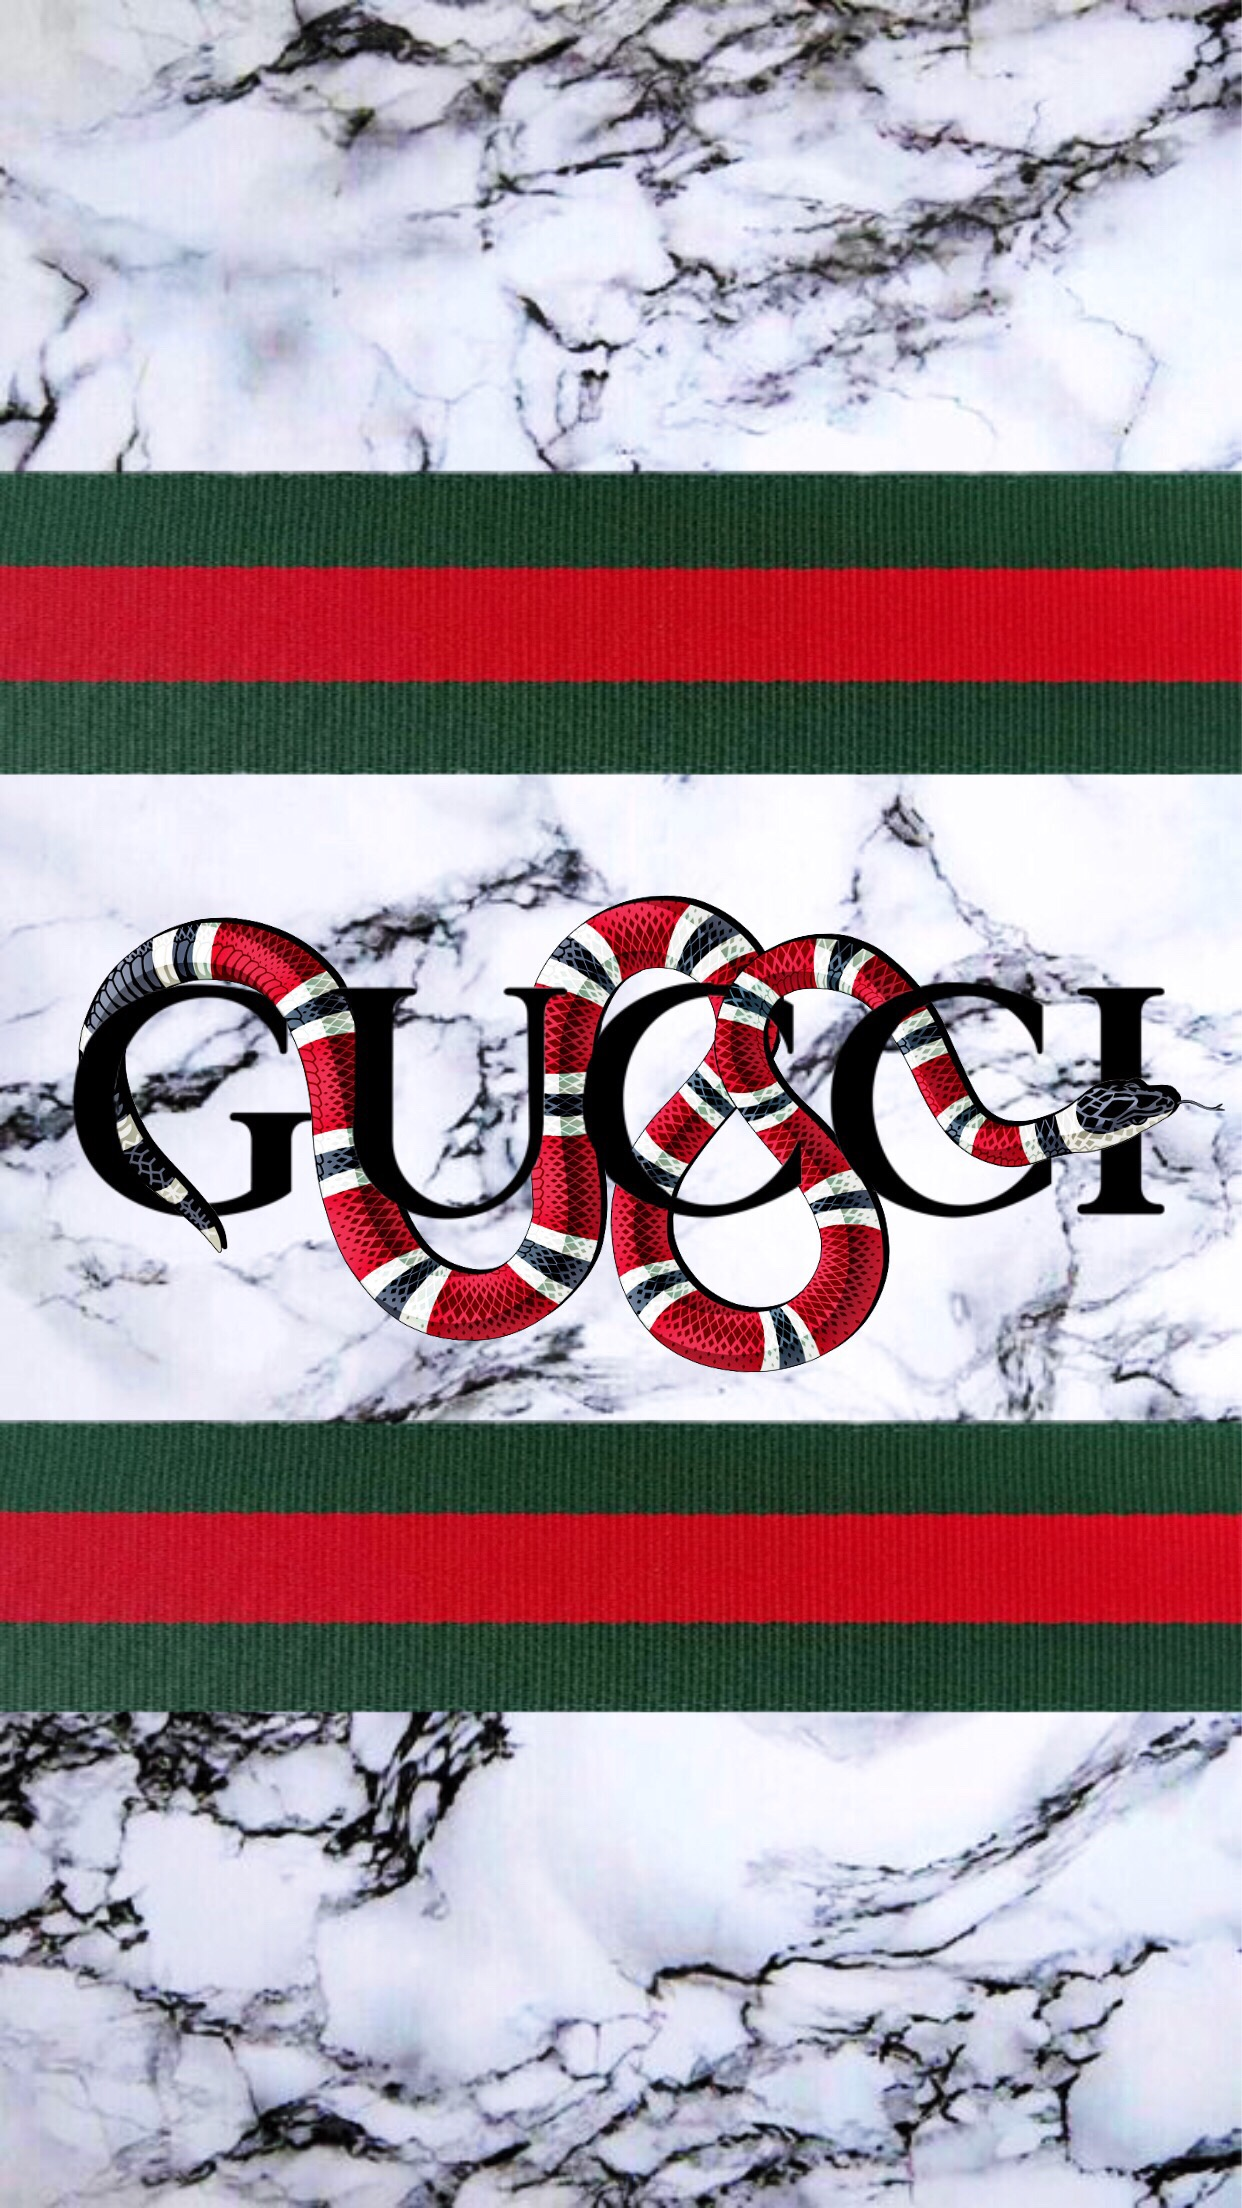 Freetoedit Gucci Wallpaper Marble Snake Hopeulikeit Lock Screen Marble Wallpaper Iphone 1242x2208 Wallpaper Teahub Io